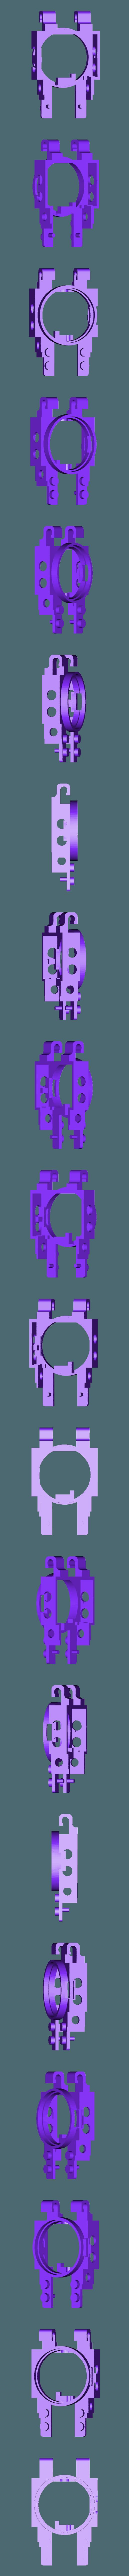 Ita9.stl Download free STL file Small Humanoid Robot • 3D printable design, choimoni